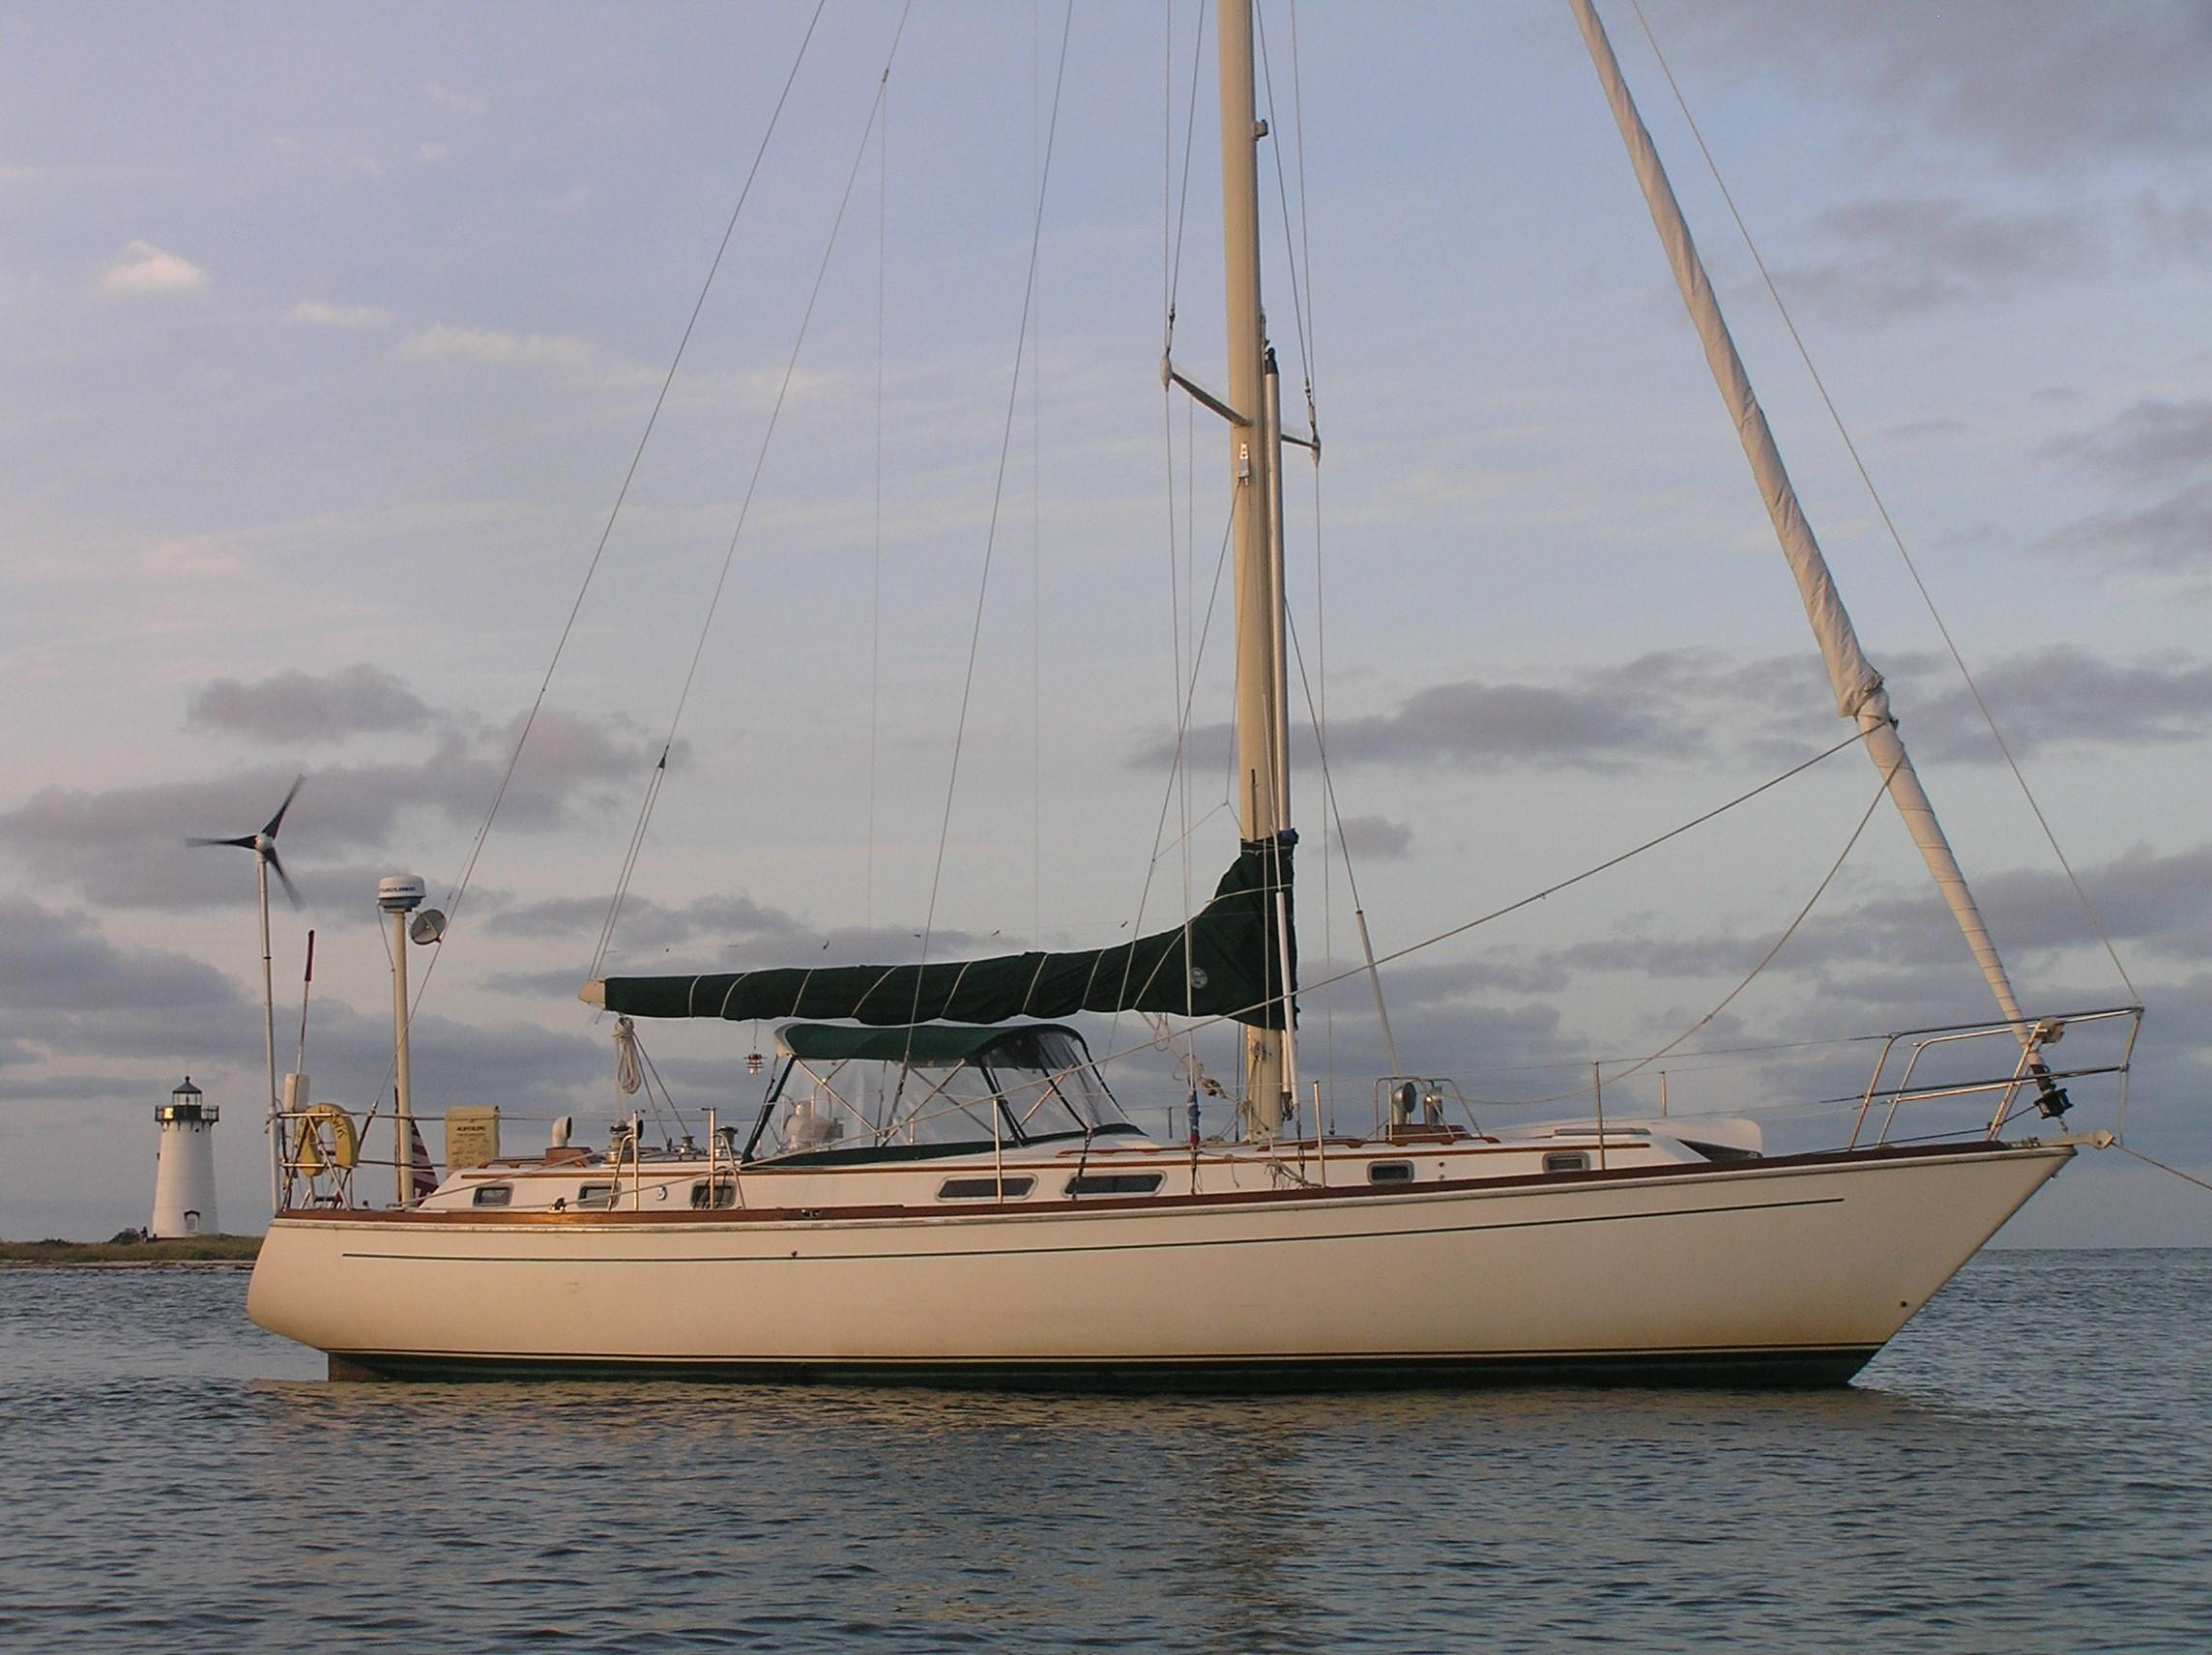 1982 Gulfstar 44 Center Cockpit Sloop Sail Boat For Sale